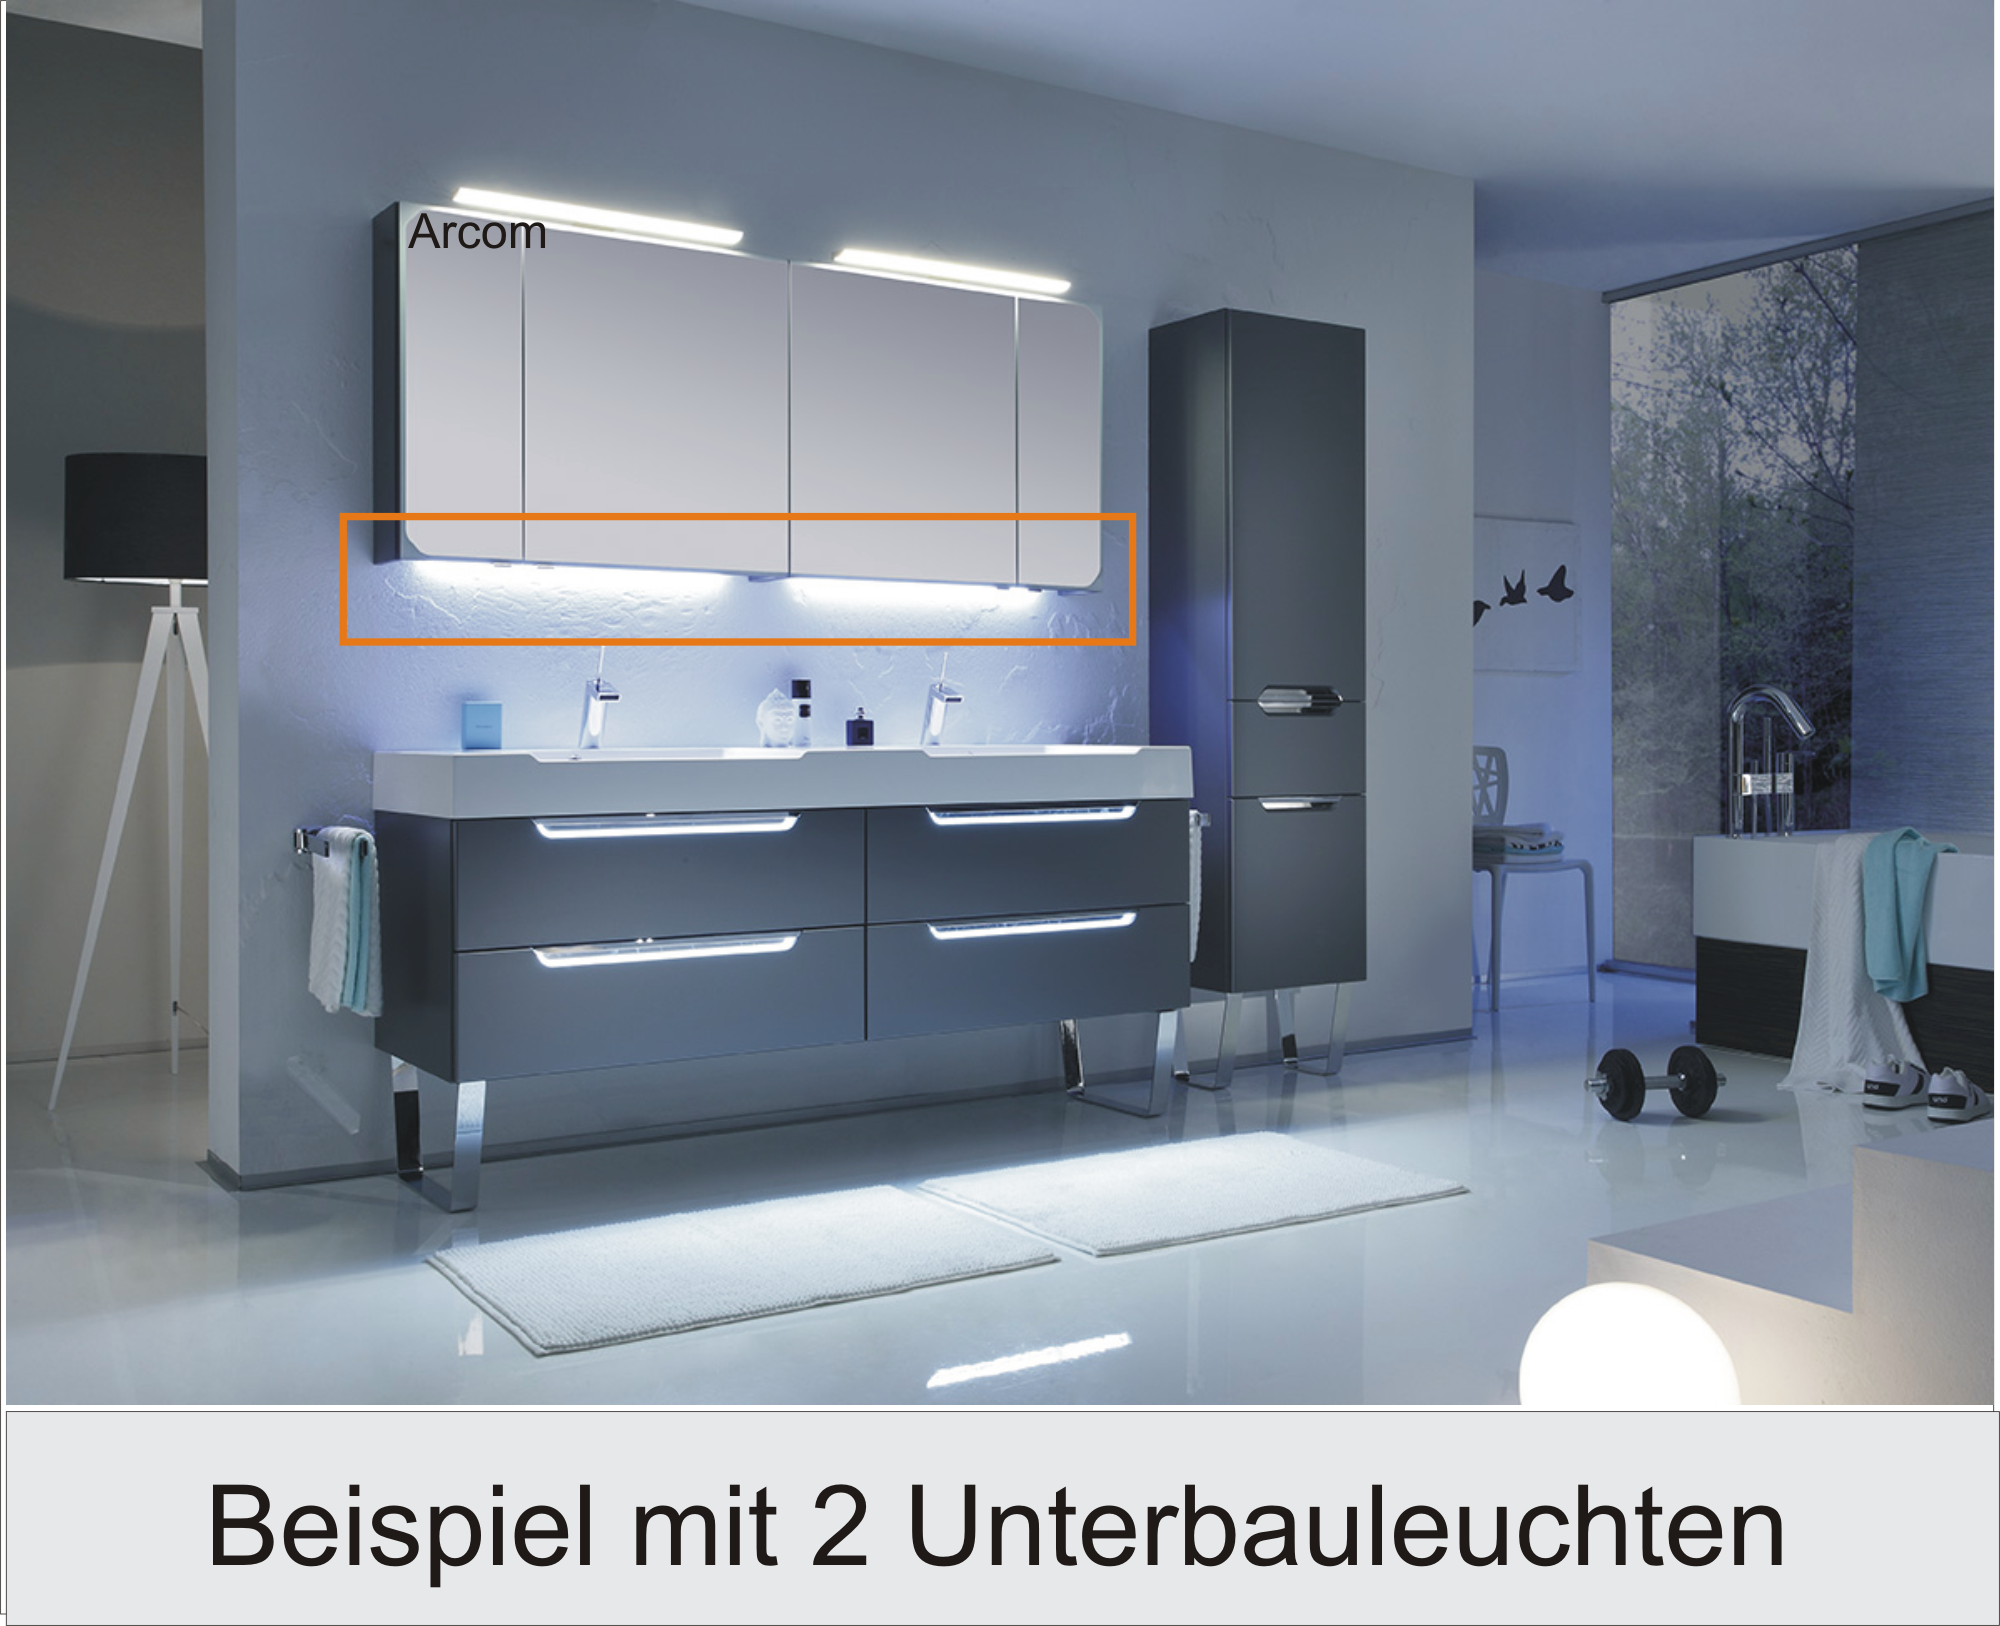 pelipal s5 led zusatzbeleuchtung arcom center. Black Bedroom Furniture Sets. Home Design Ideas